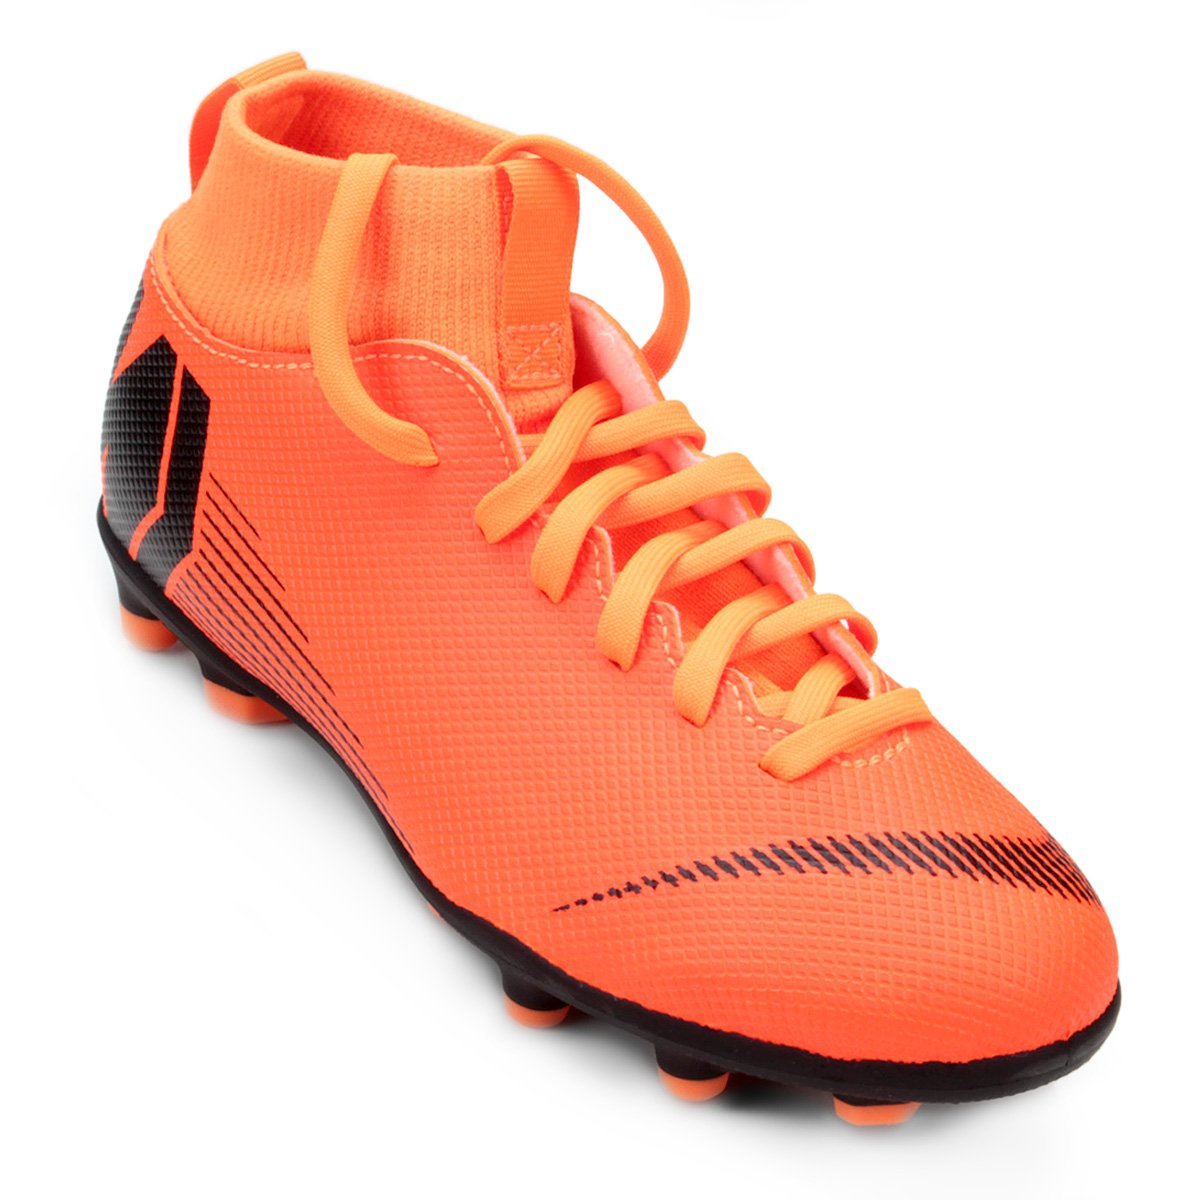 b97bb7409a Chuteira Campo Infantil Nike Mercurial Superfly 6 Club - Laranja e ...